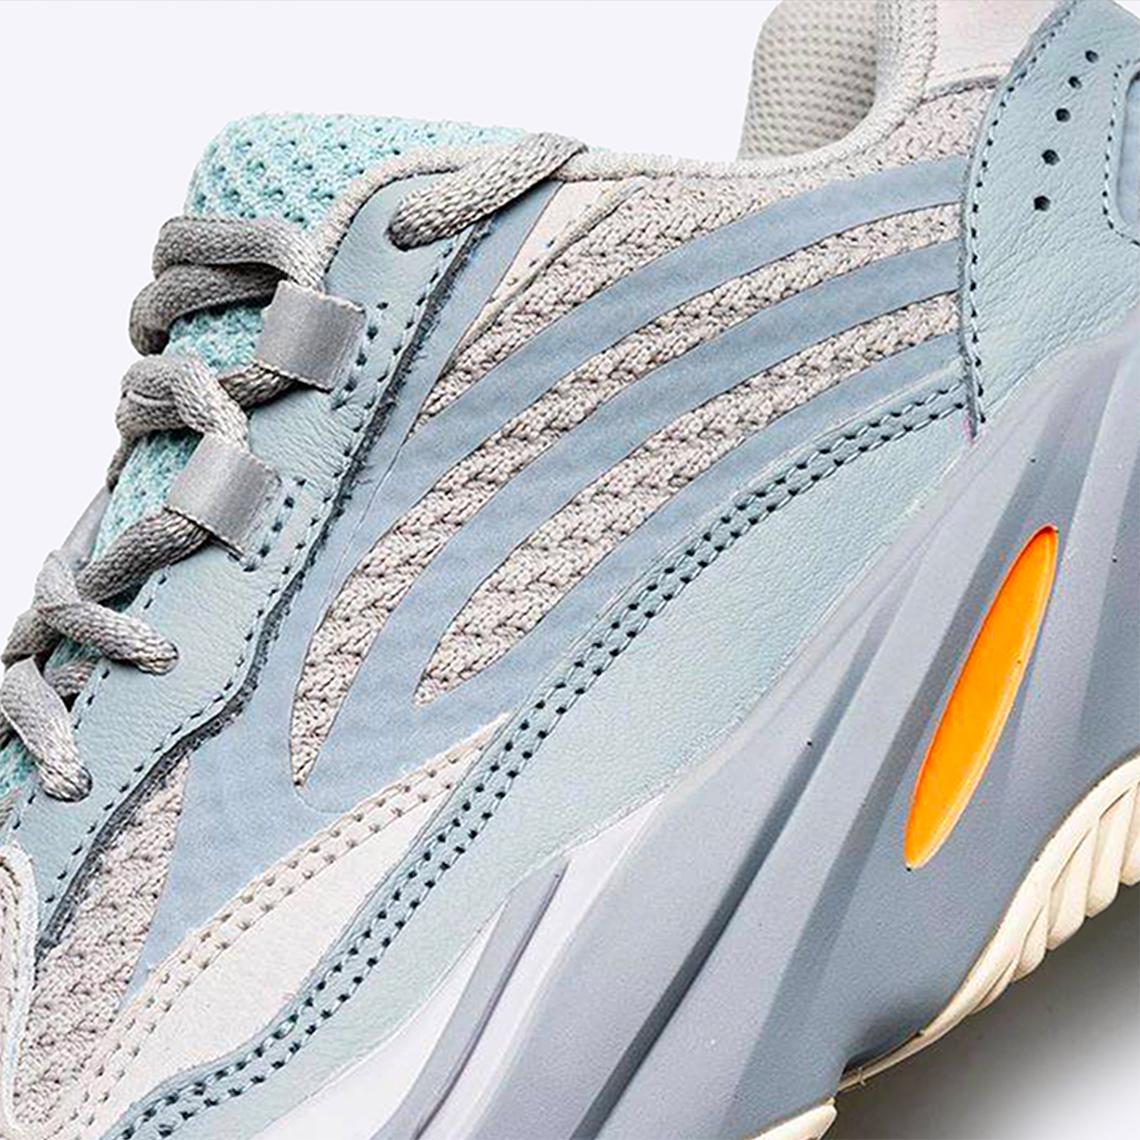 adidas Yeezy 700 v2 Inertia Release